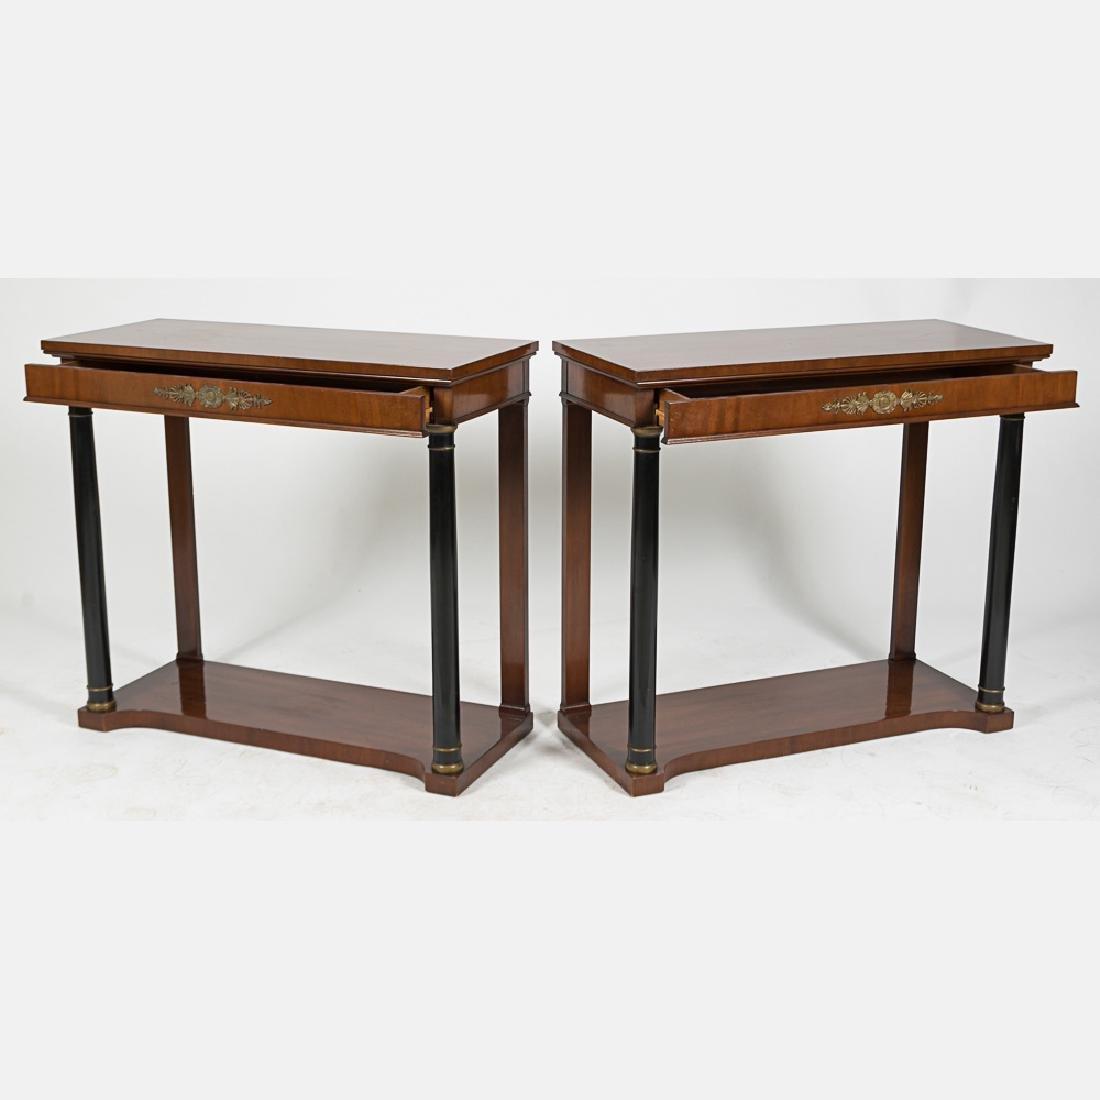 A Pair of Kittinger Mahogany and Ebonized Wood Console - 2